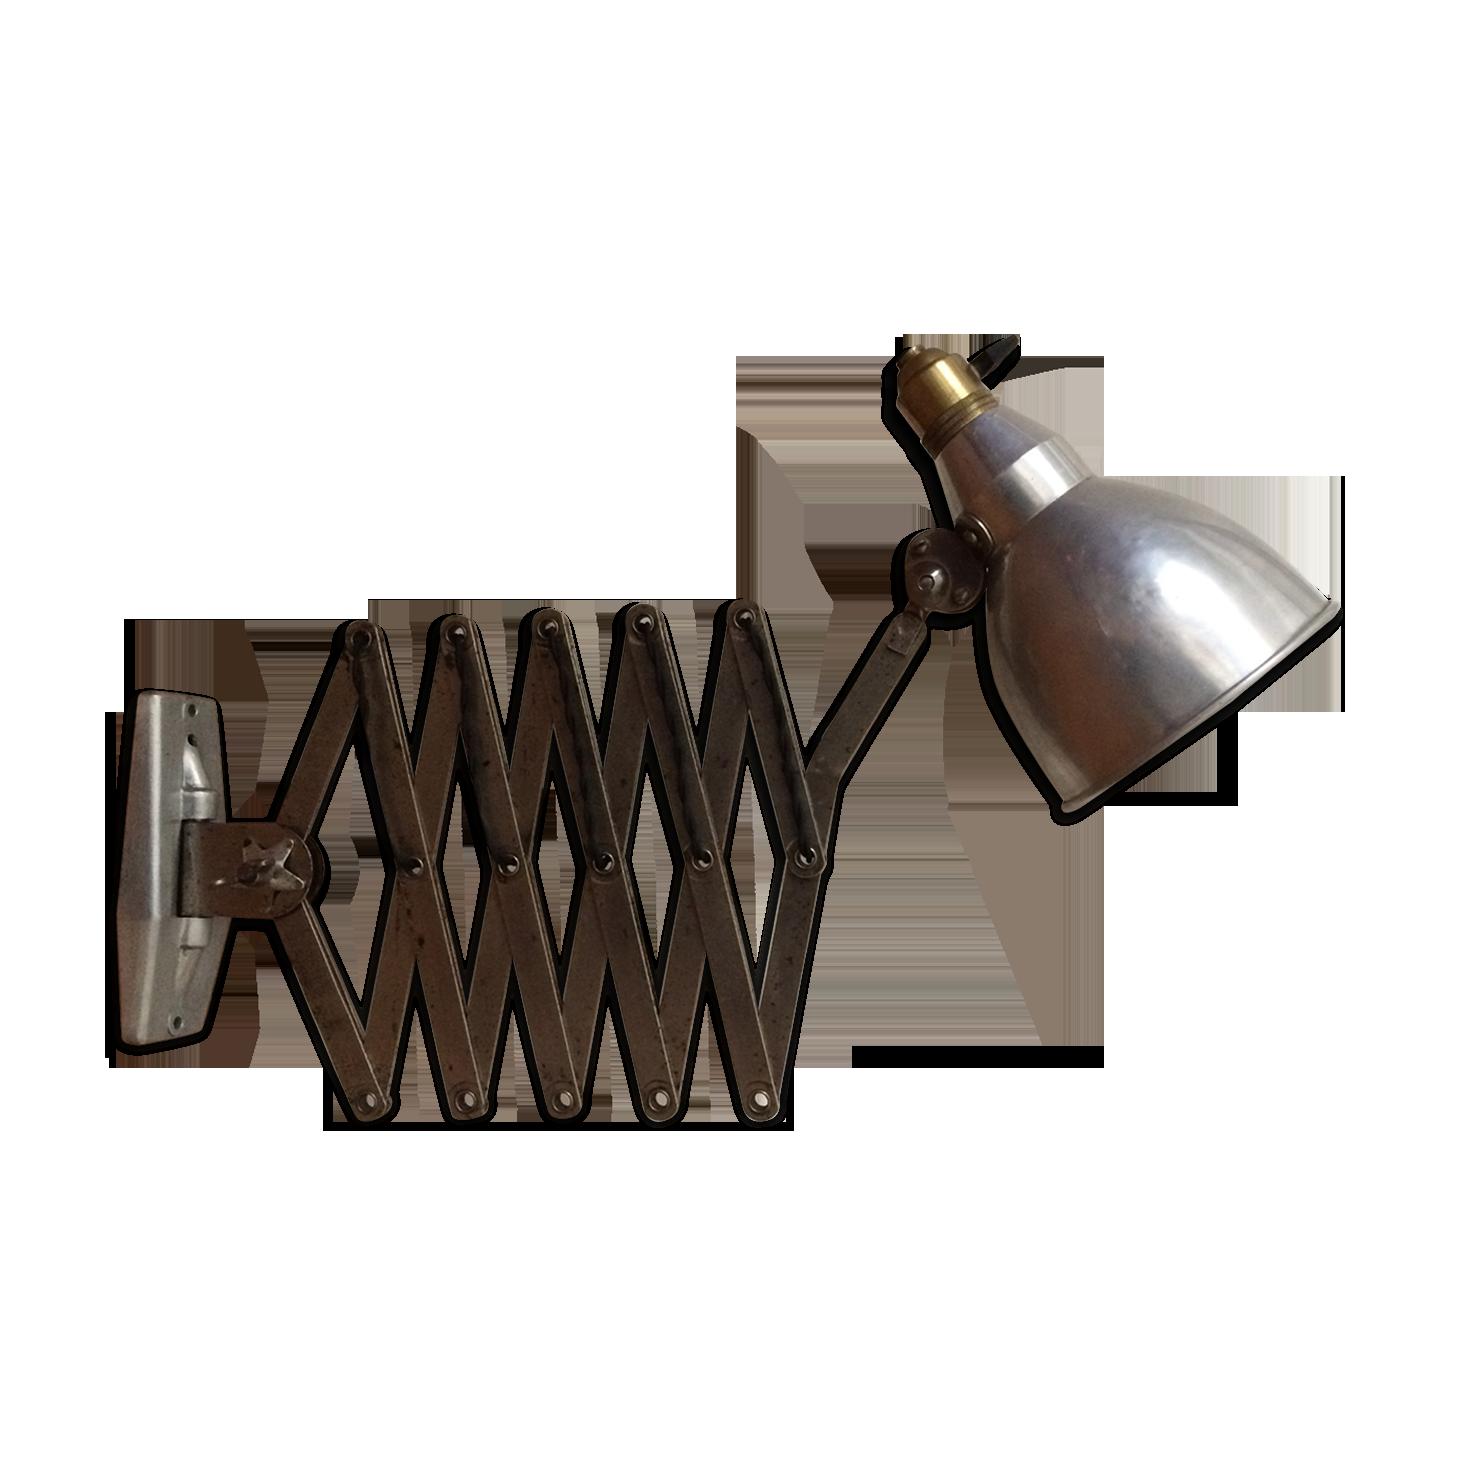 Applique scissors lamp mazda accordion workshop metal